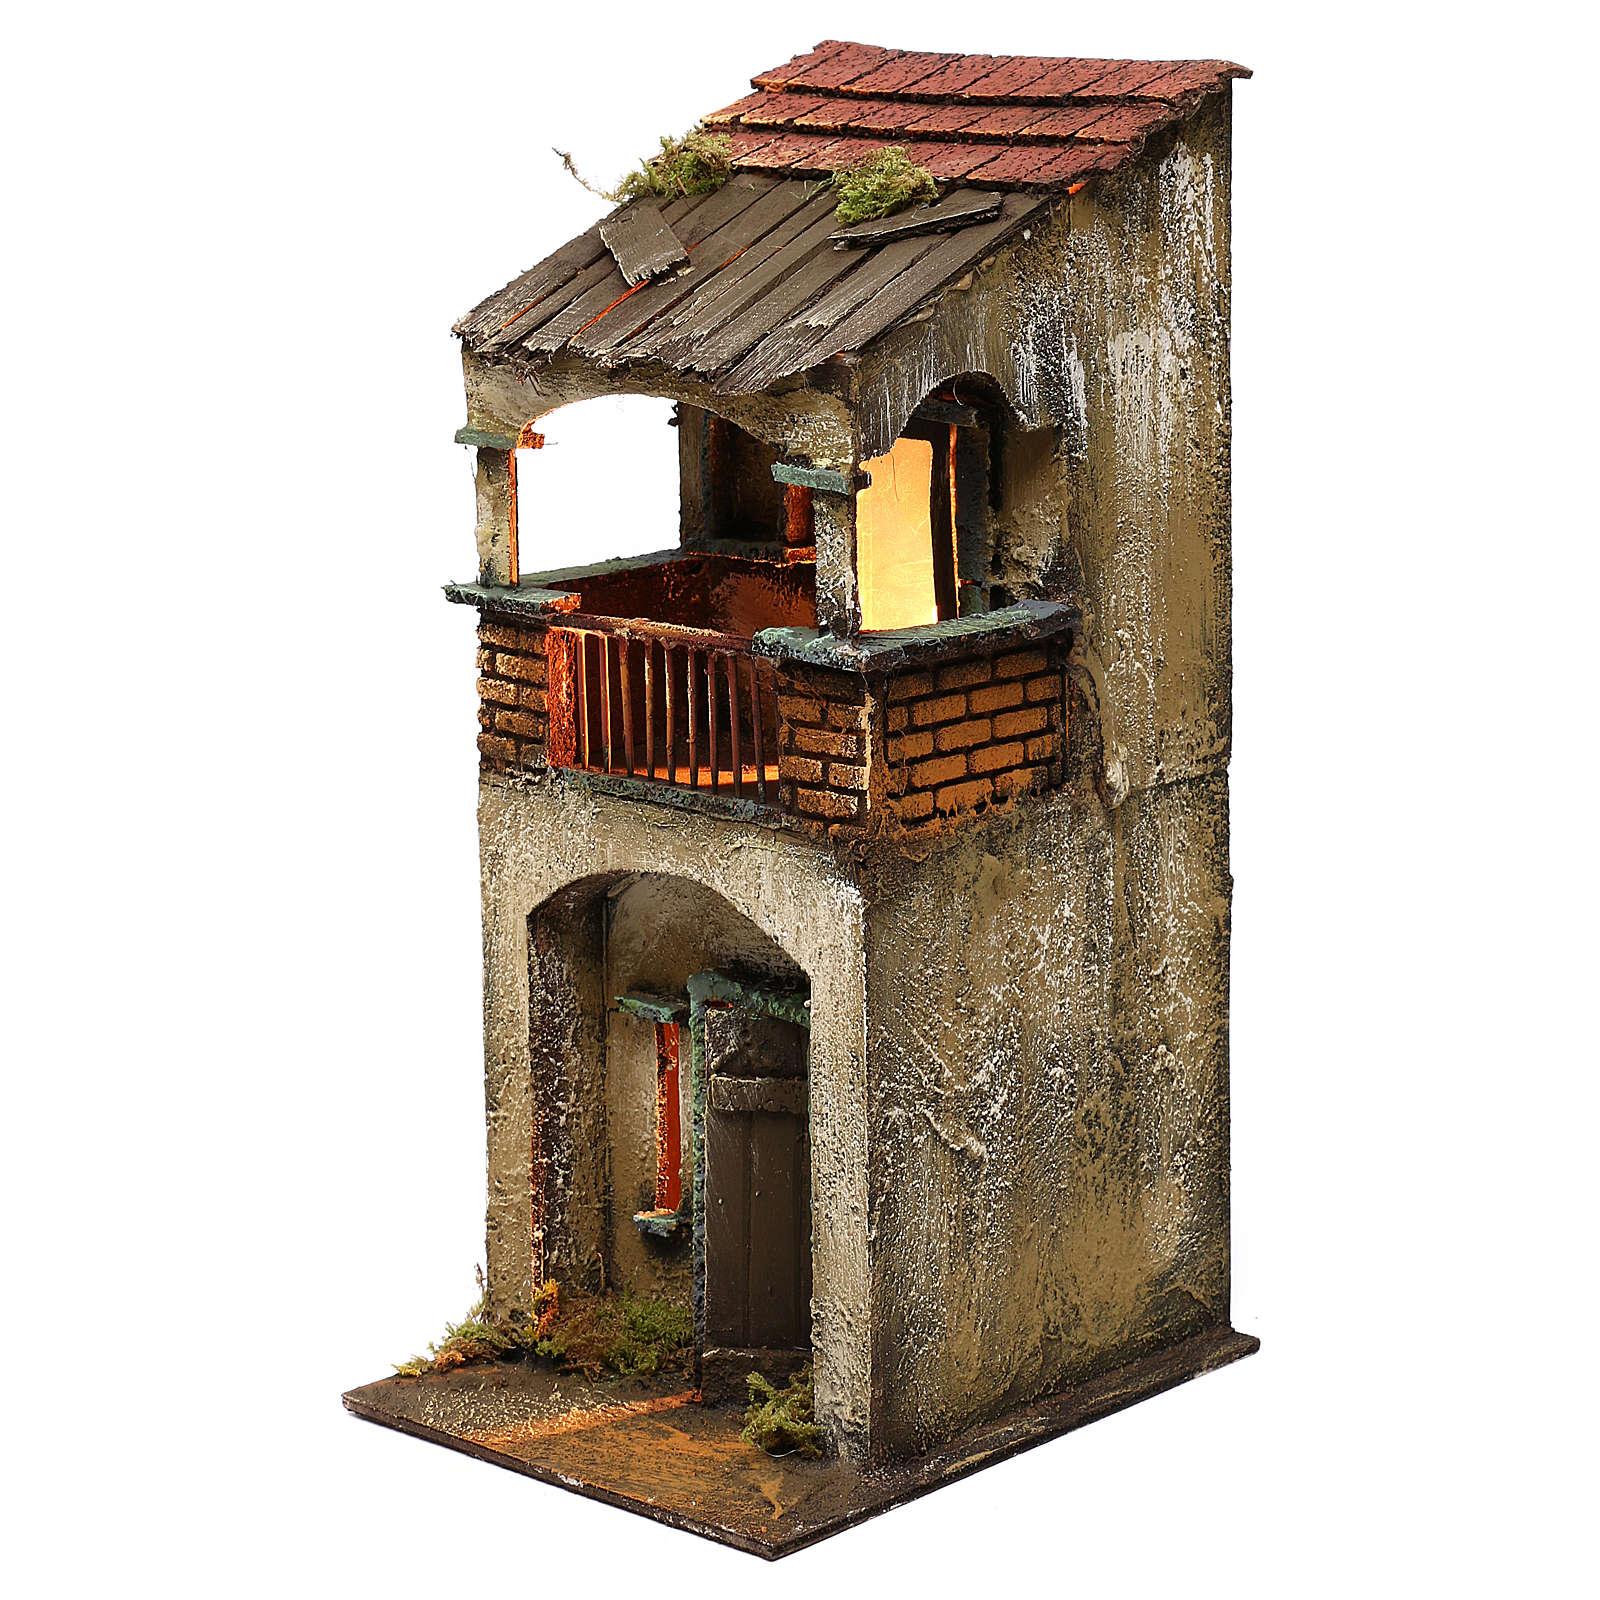 Neapolitan Nativity scene setting, two floors house with balcony 35x15x20 cm 4